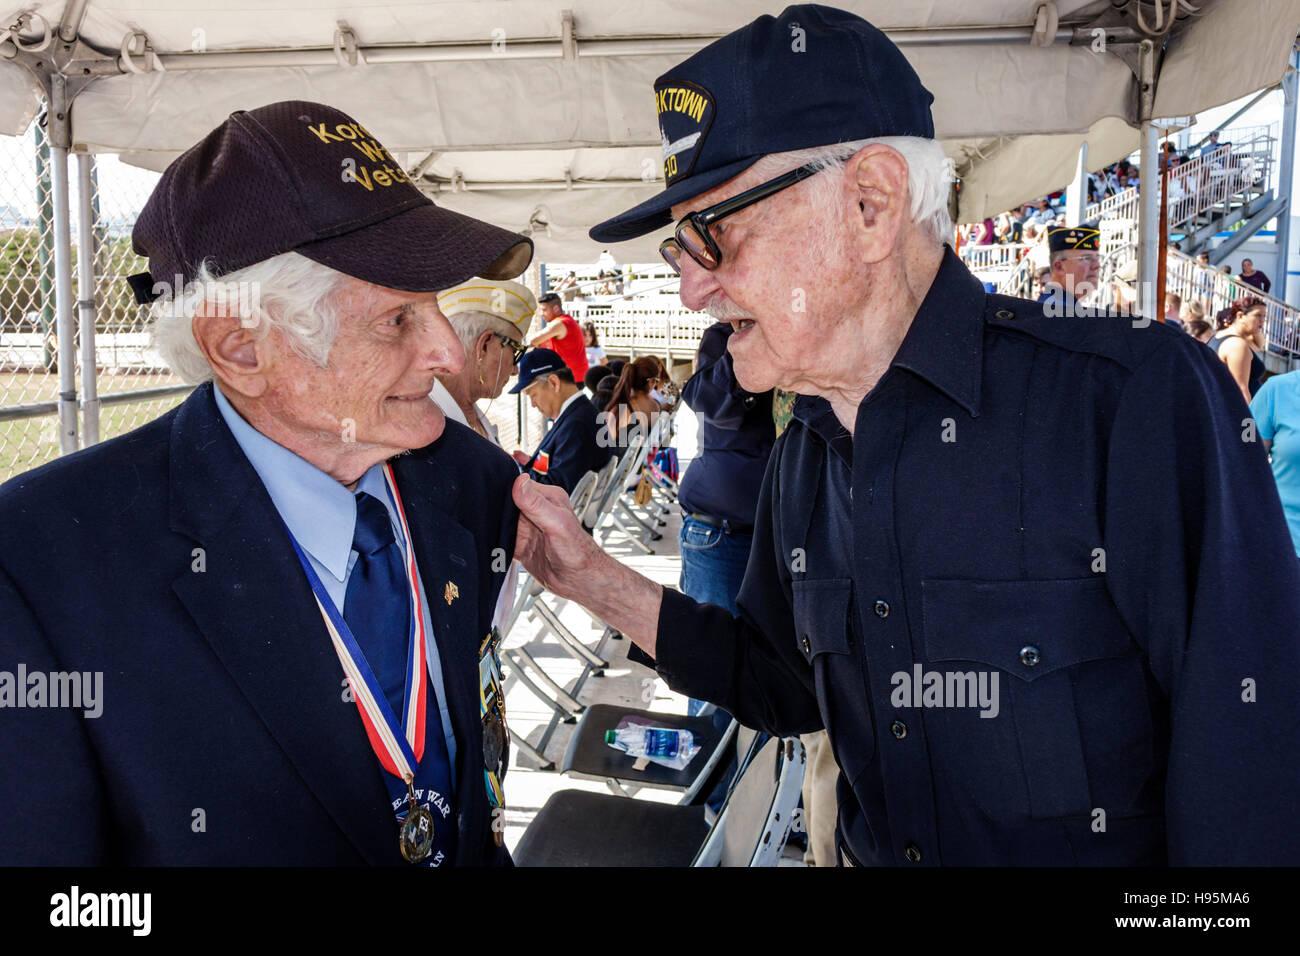 Miami Florida Beach Veterans Day celebration activities Korean War Veteran senior friends talking reminiscing - Stock Image